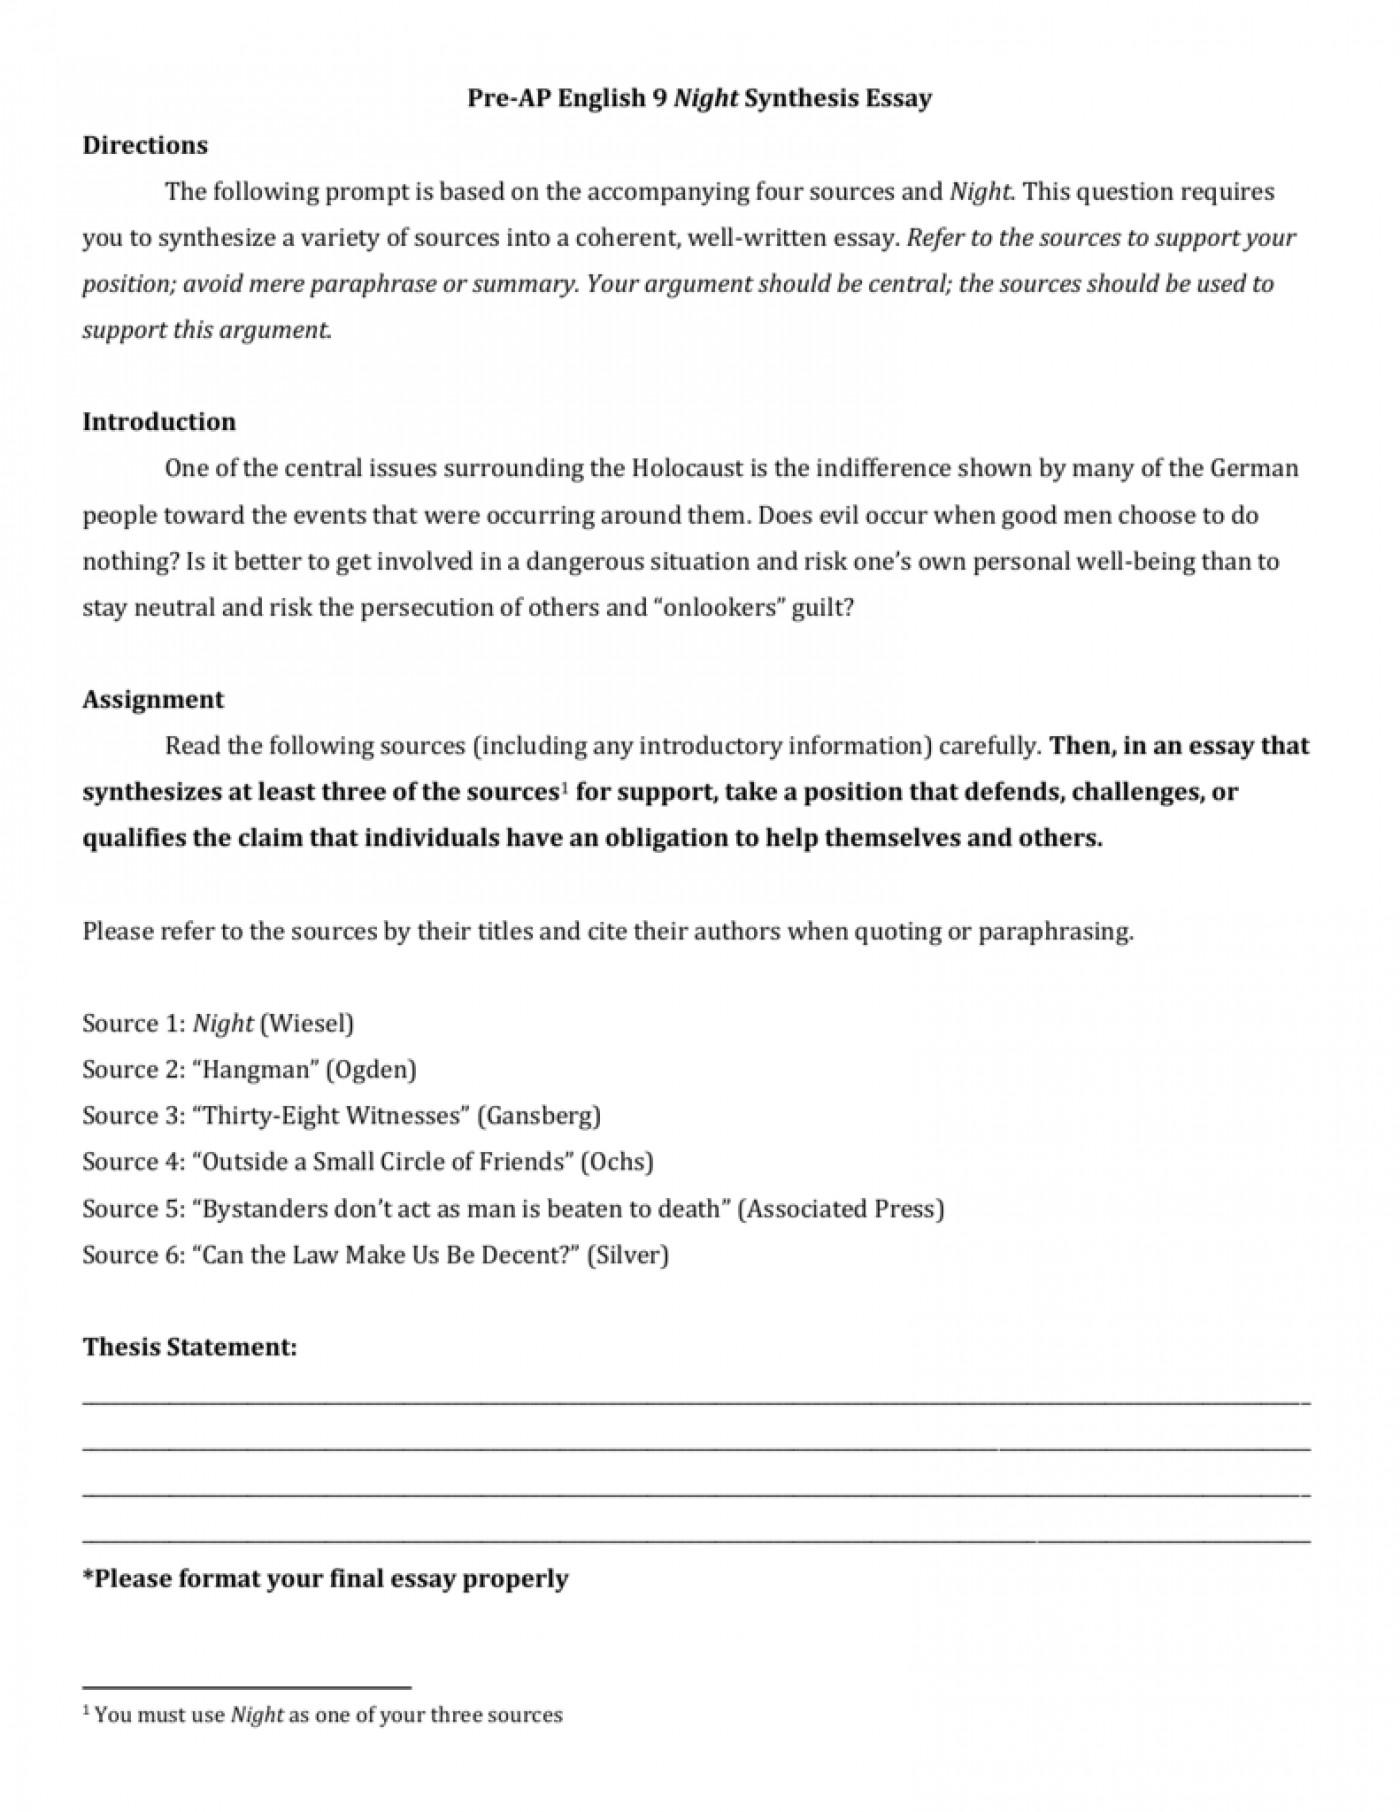 003 006963363 1 Synthesis Essay Sensational Prompt Outline Pdf 1400